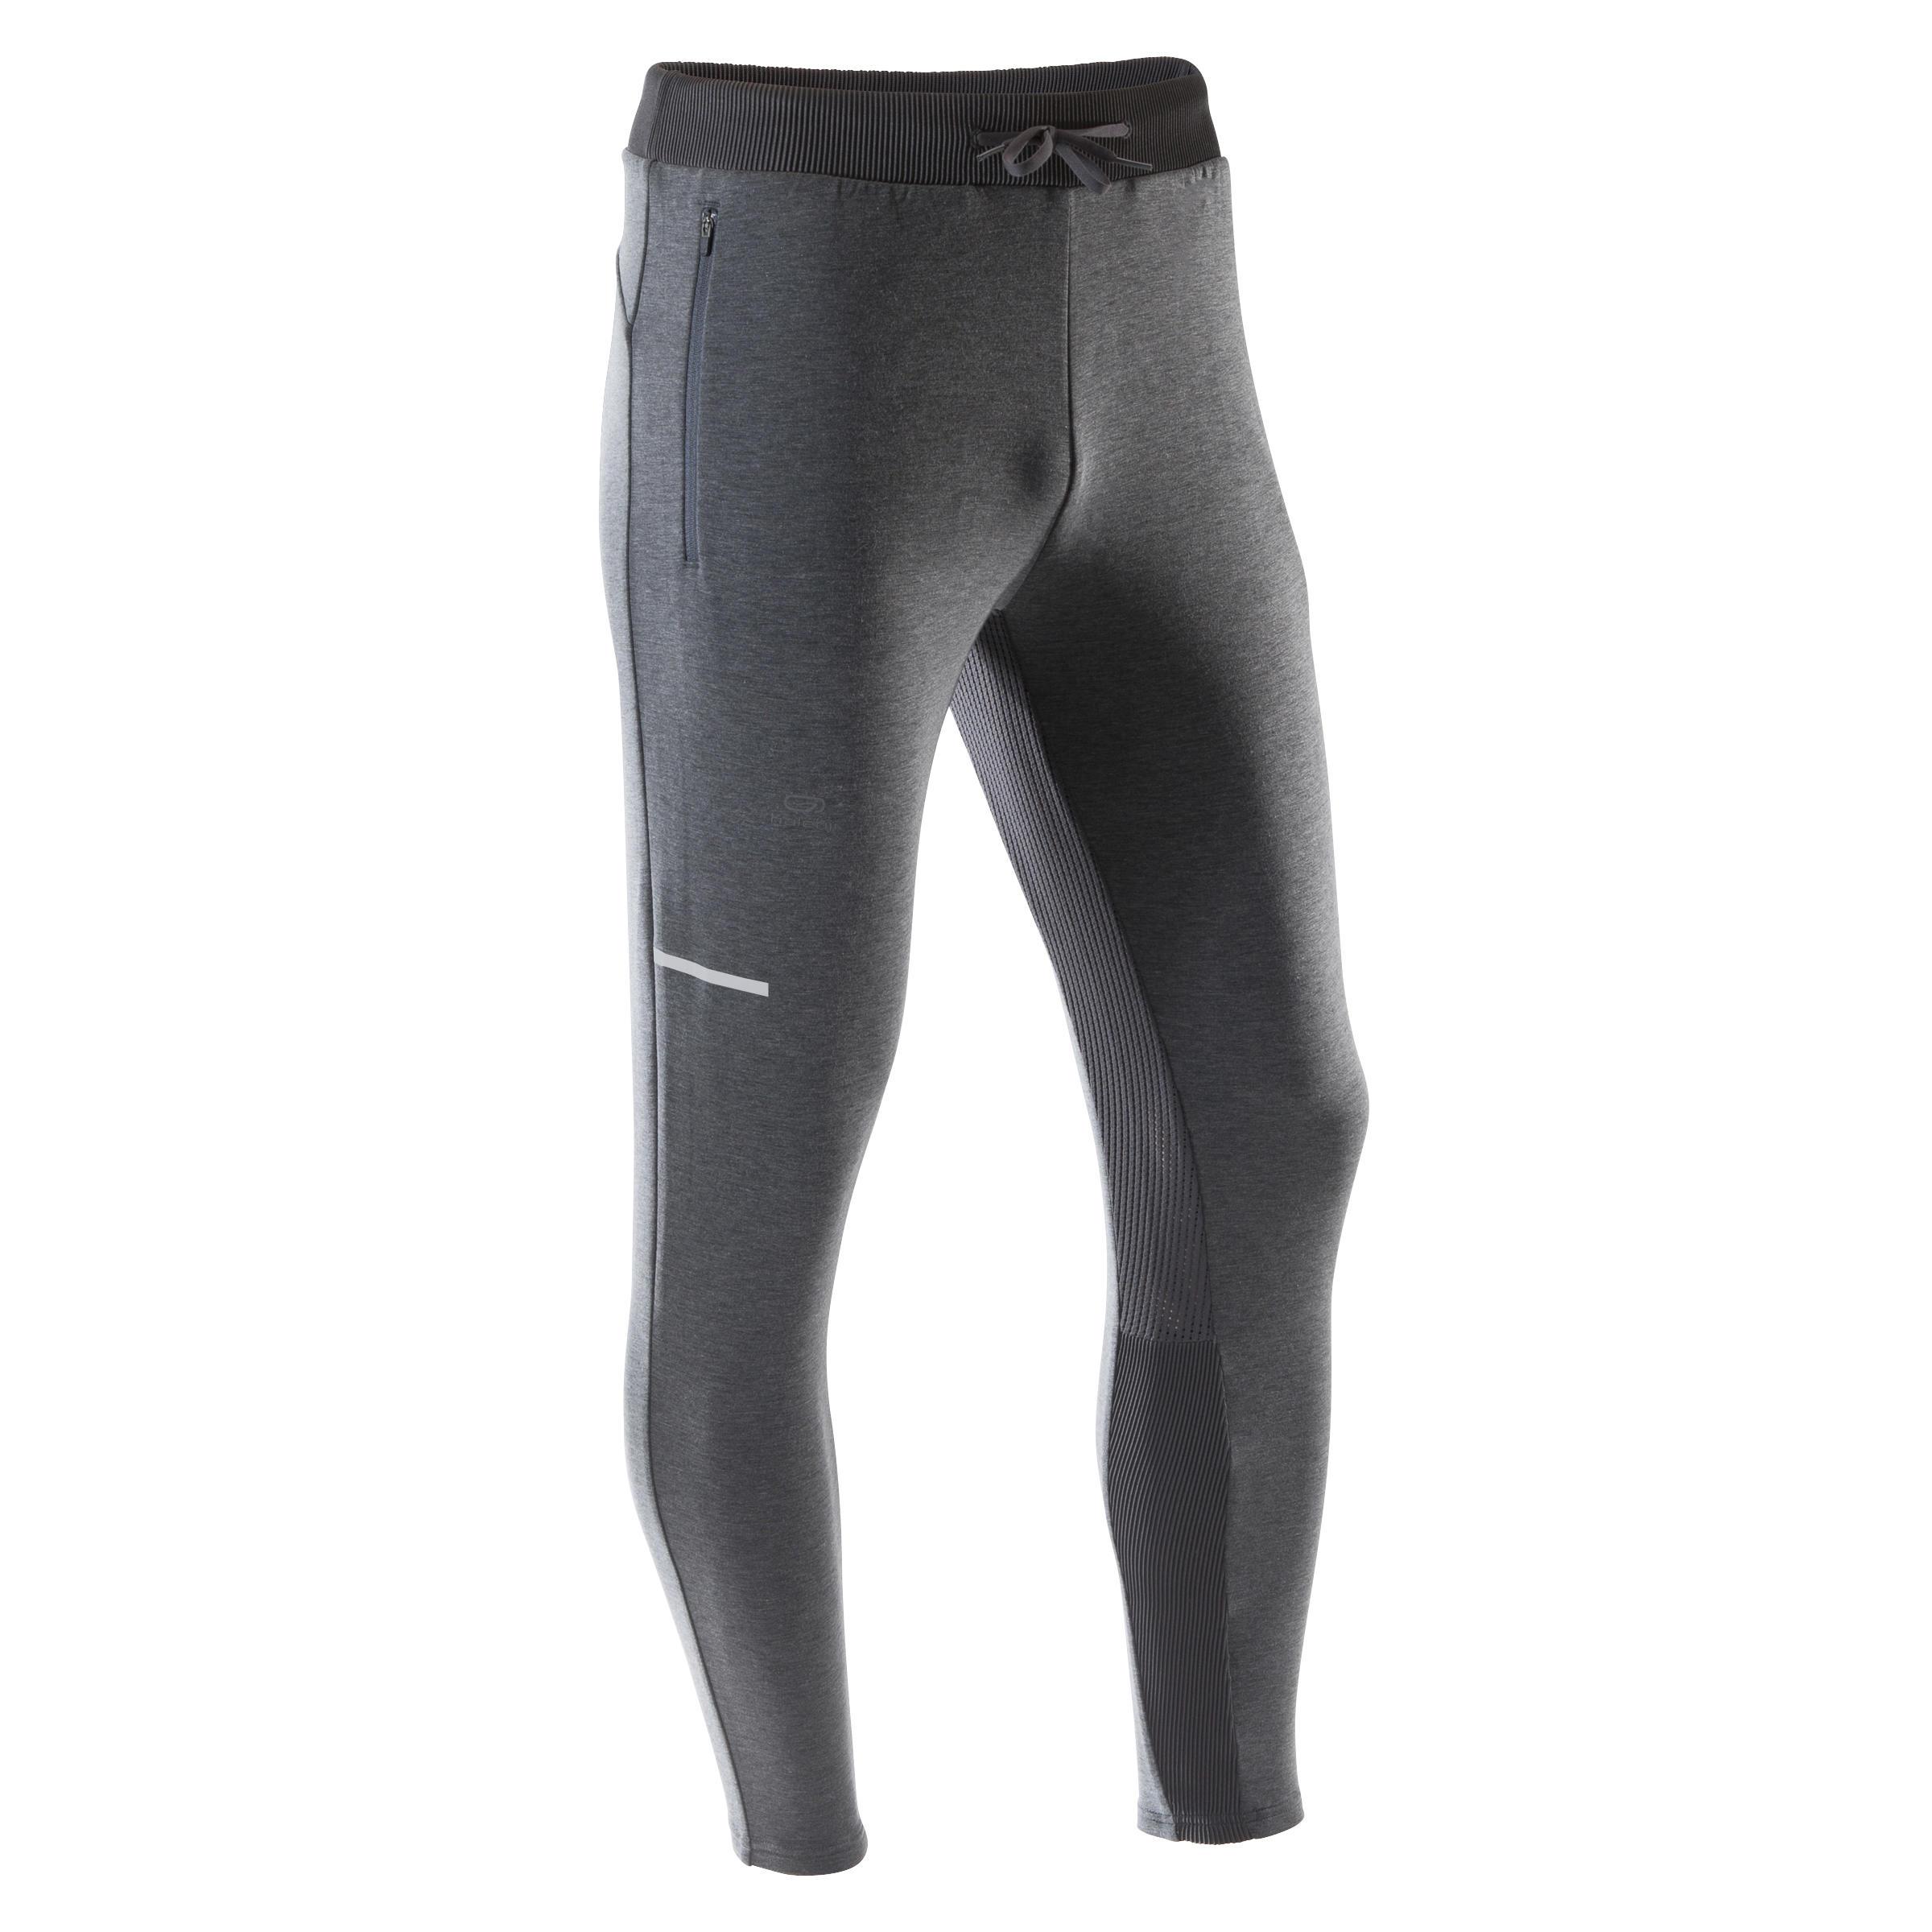 Pantalon de jogging homme run warm gris chiné kalenji